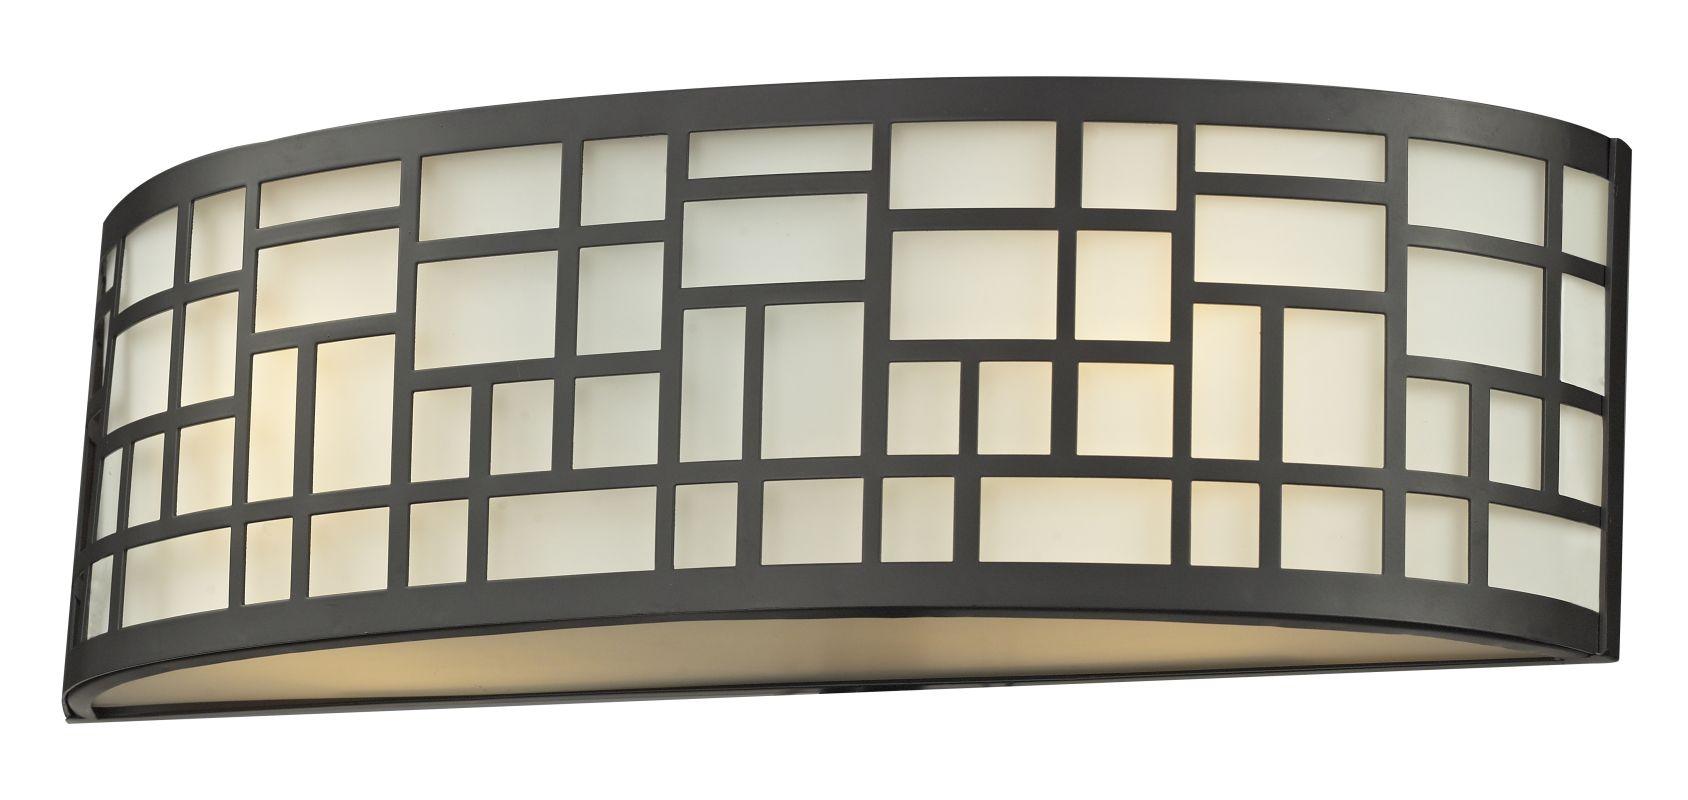 Z-Lite 329-2V Elea 2 Light ADA Compliant Bathroom Vanity Light with Sale $238.00 ITEM: bci2518633 ID#:329-2V-BRZ UPC: 685659028645 :